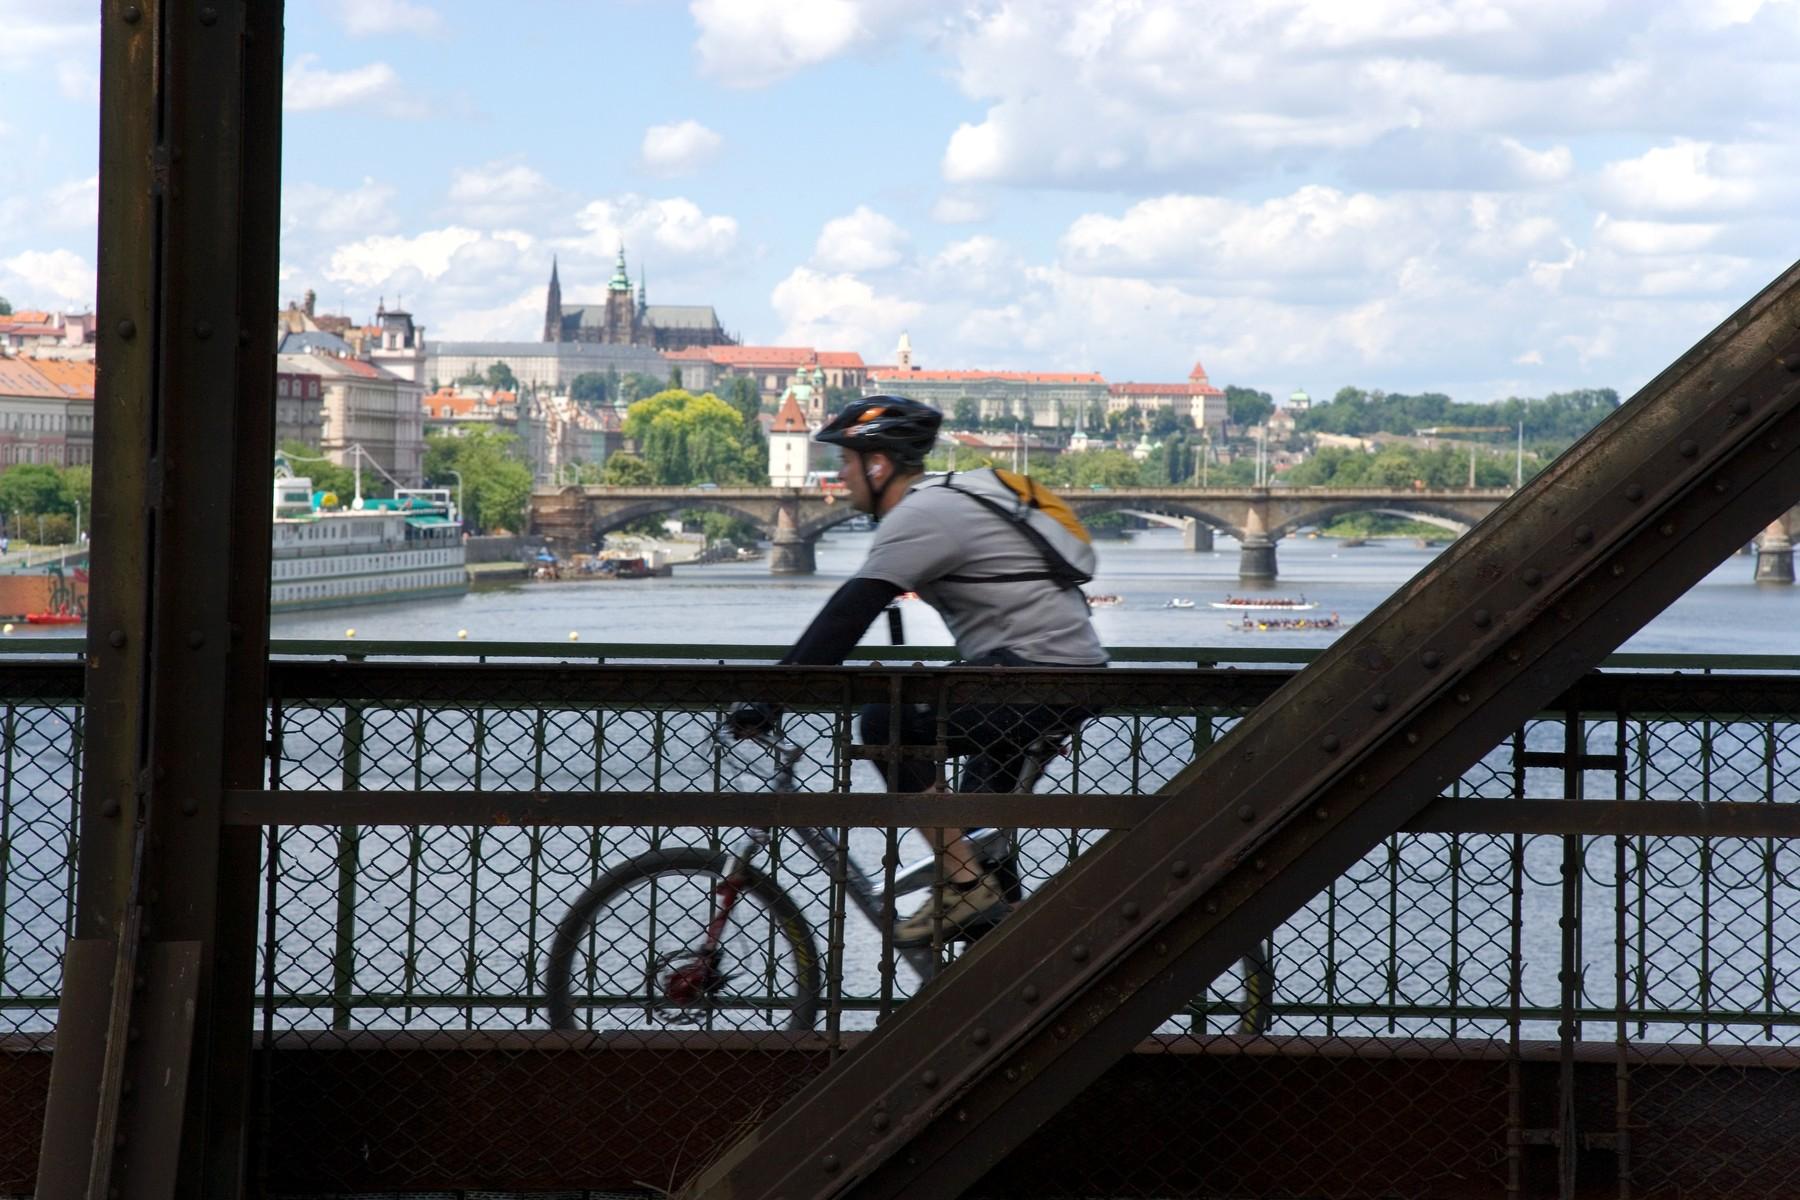 Prazsky hrad, Hradcany a reka Vltava ze zeleznicniho mostu, Praha, Ceska republika